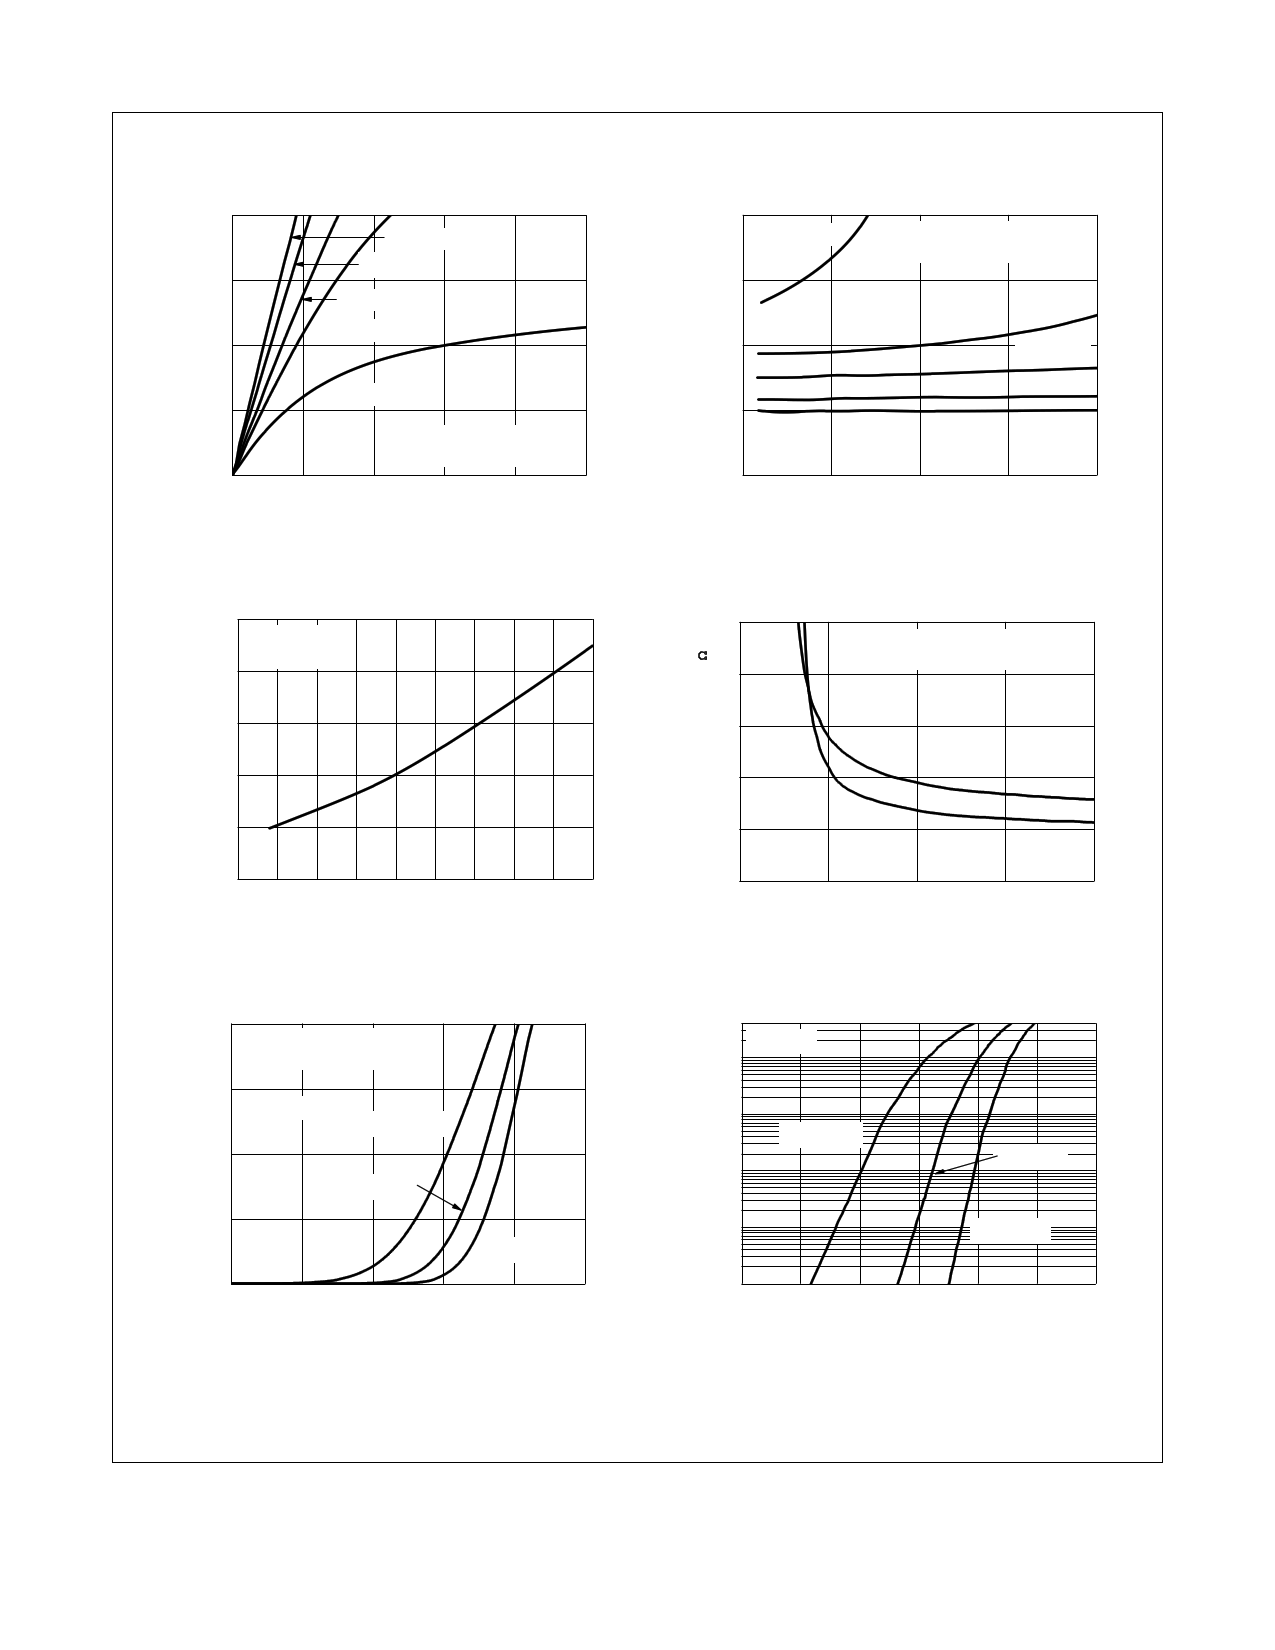 FDMS3604AS pdf, 반도체, 판매, 대치품